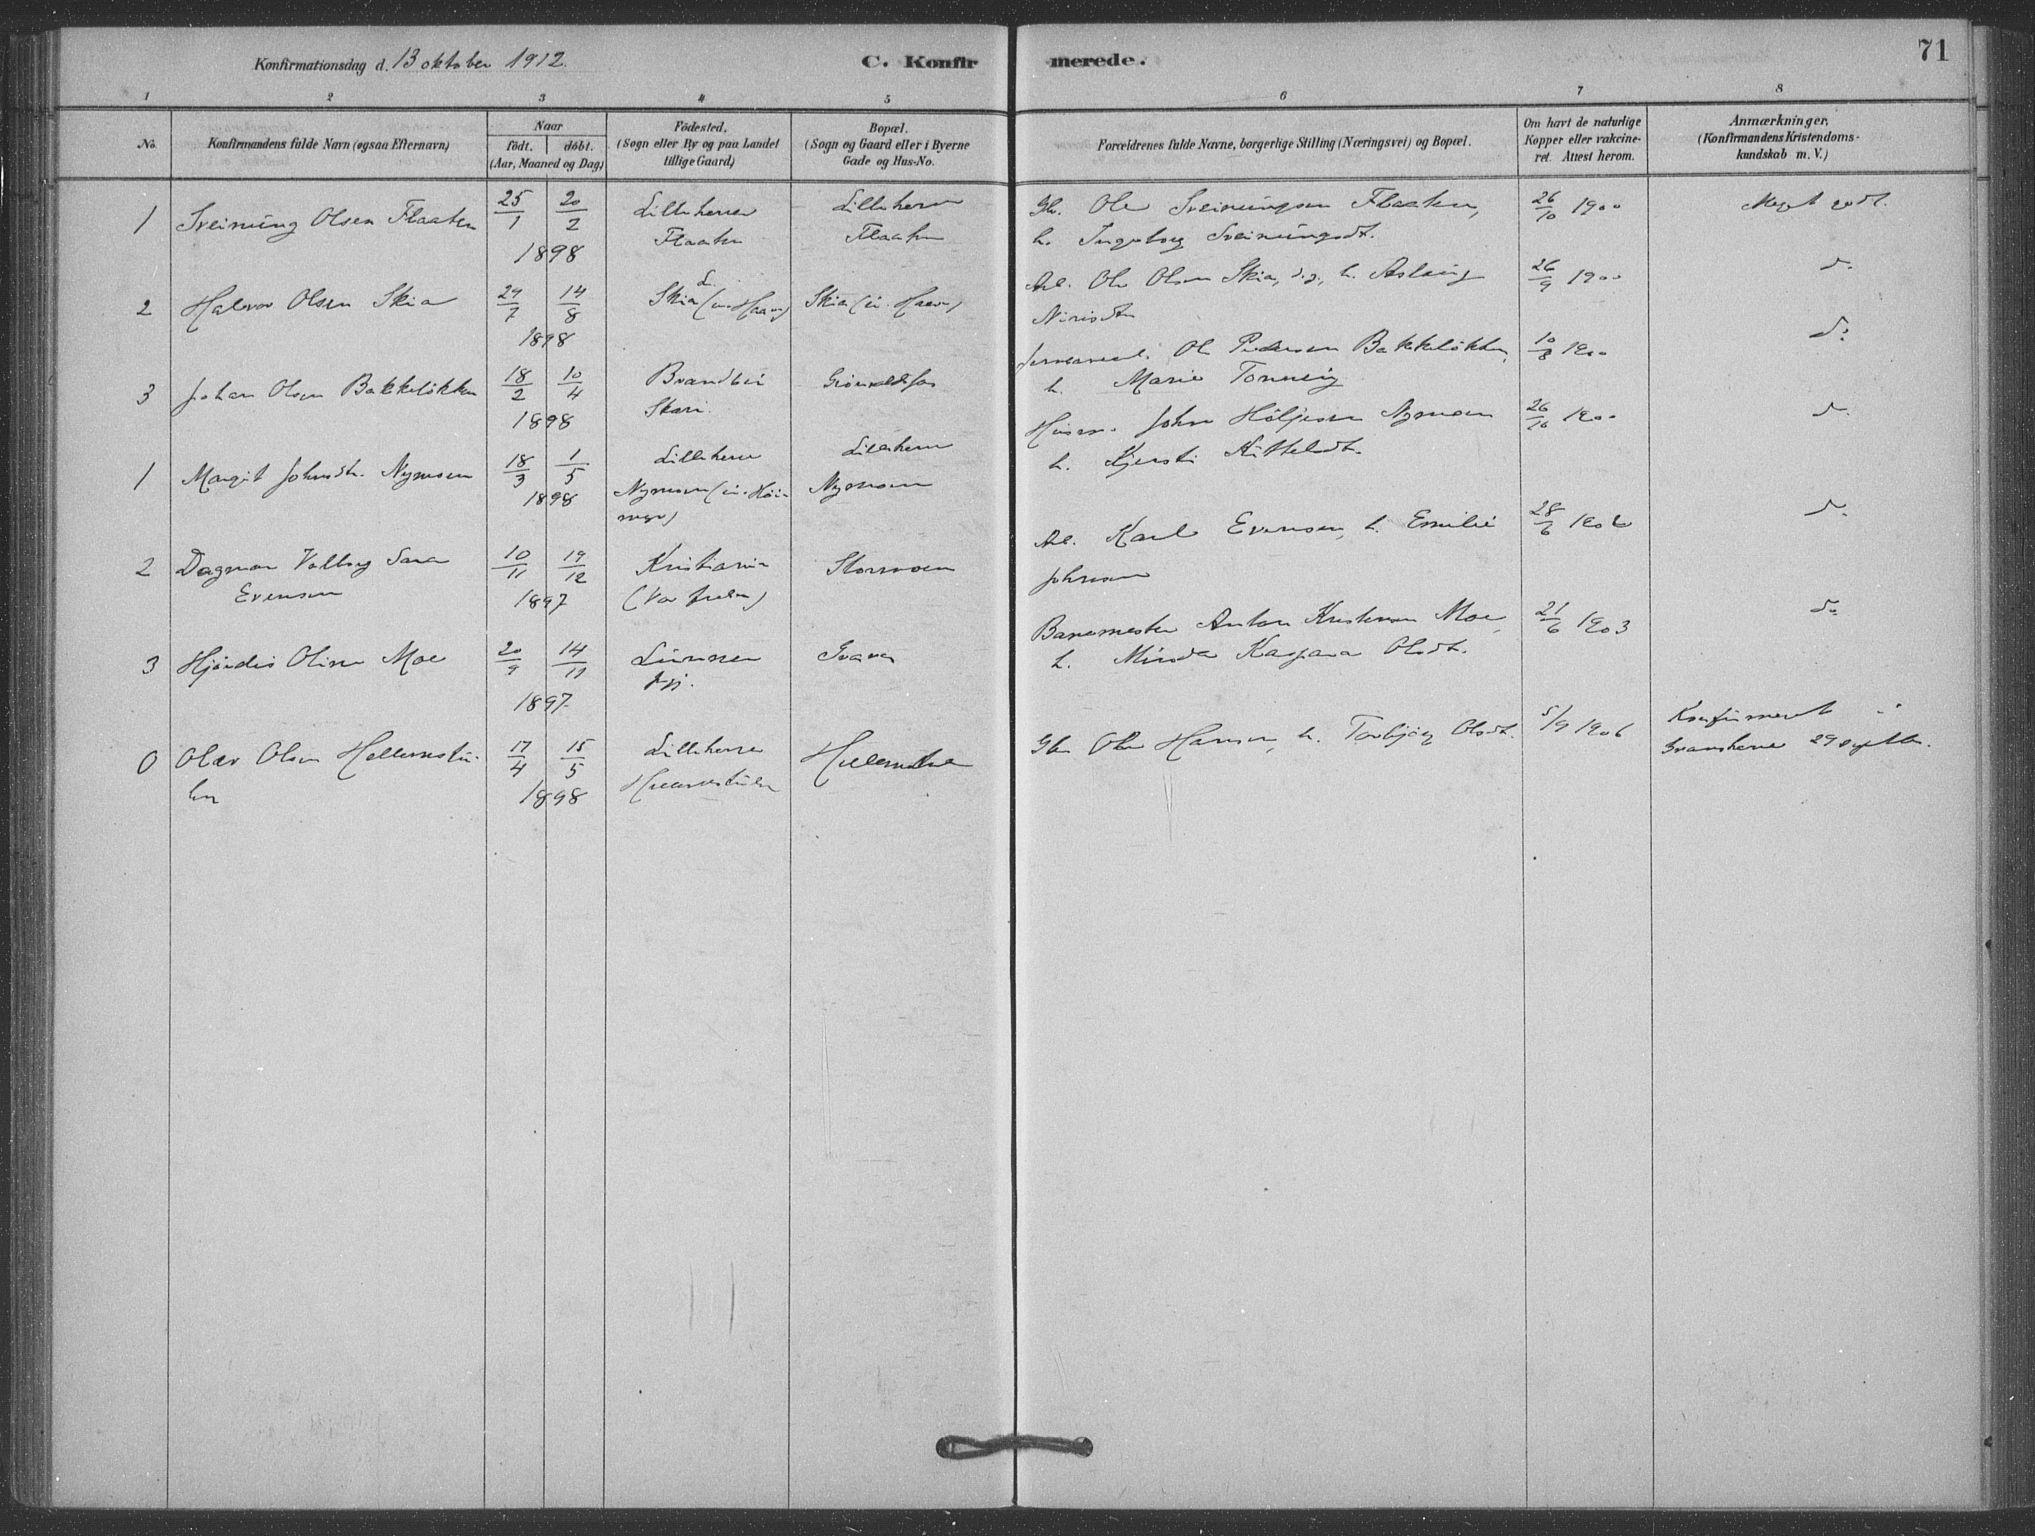 SAKO, Heddal kirkebøker, F/Fb/L0002: Ministerialbok nr. II 2, 1878-1913, s. 71